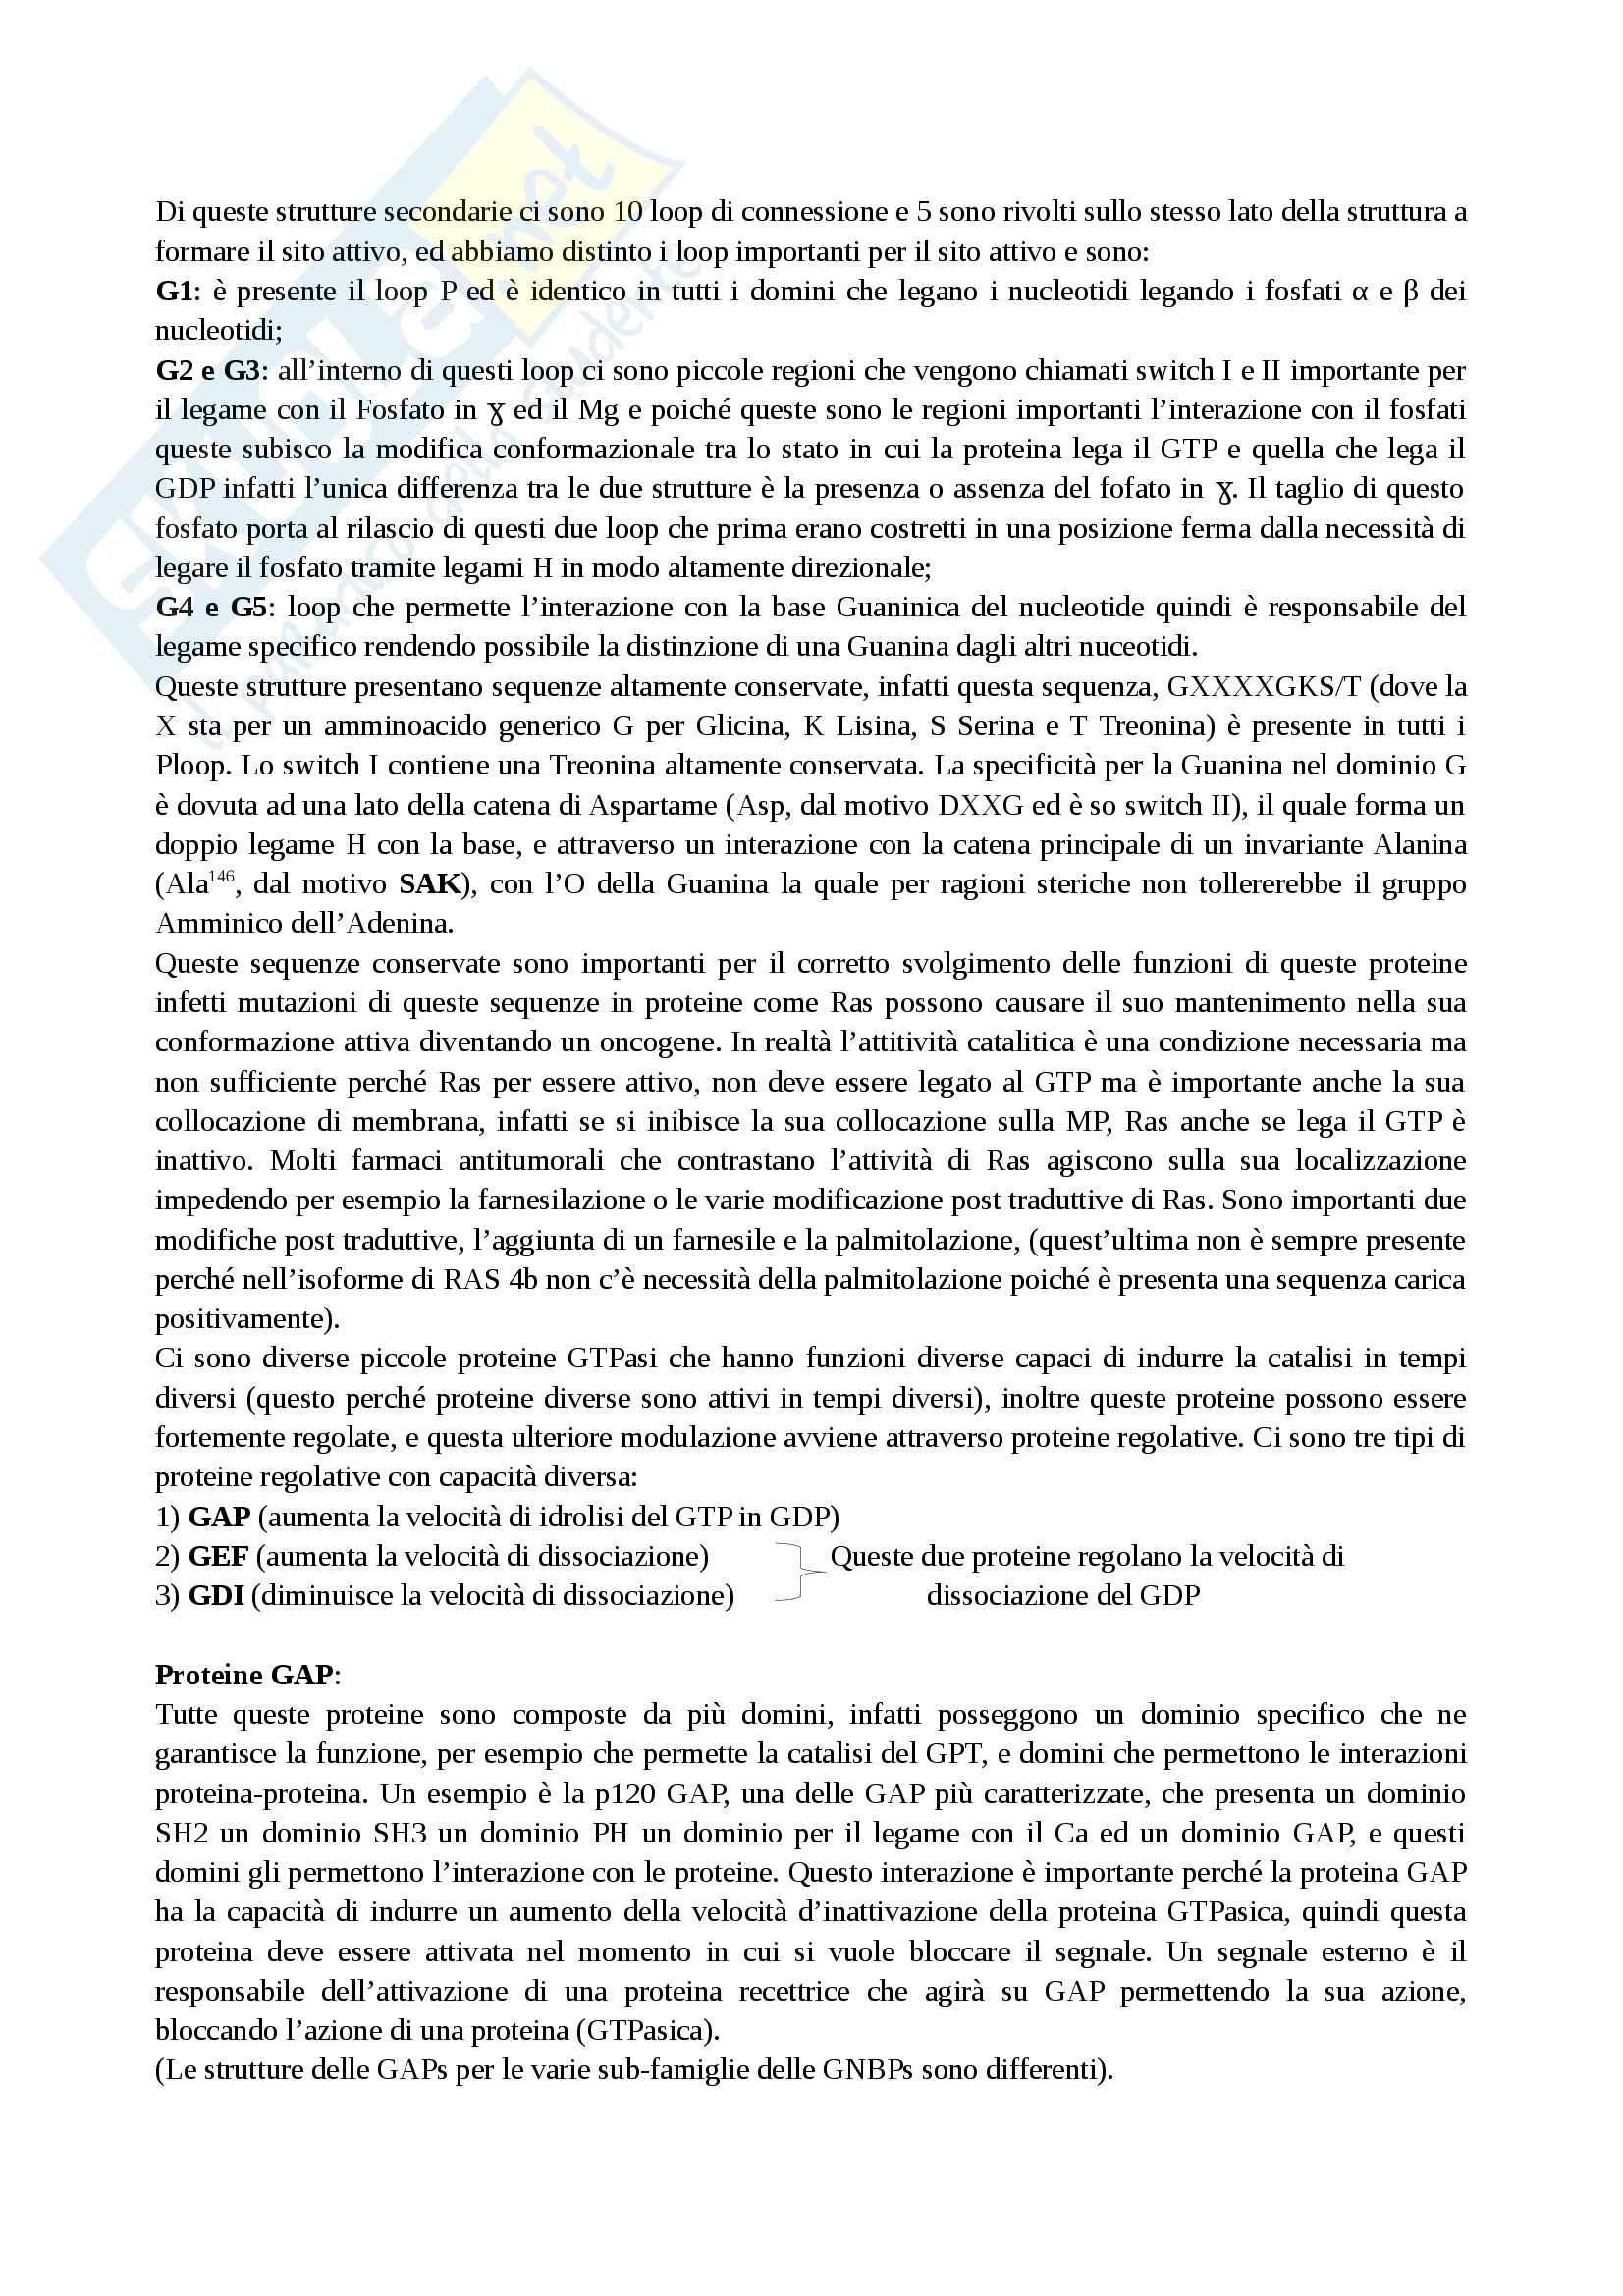 Le piccole GTPasi e molecole regolative Pag. 2